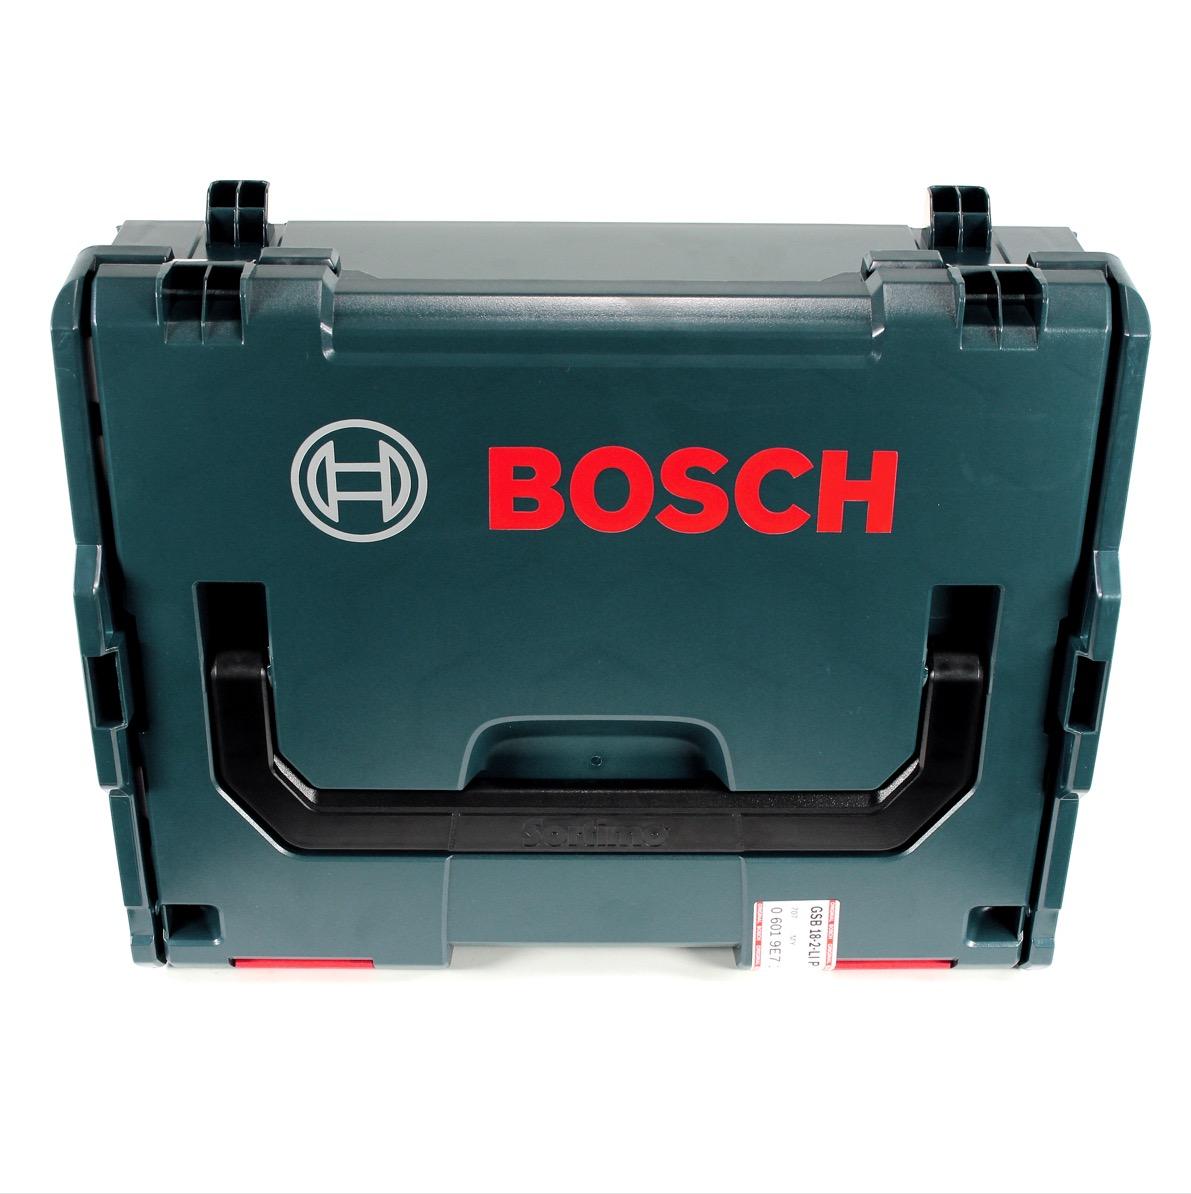 bosch gsb 18 2 li plus akku schlagbohrschrauber l boxx 2x 6 ah akku lader ebay. Black Bedroom Furniture Sets. Home Design Ideas